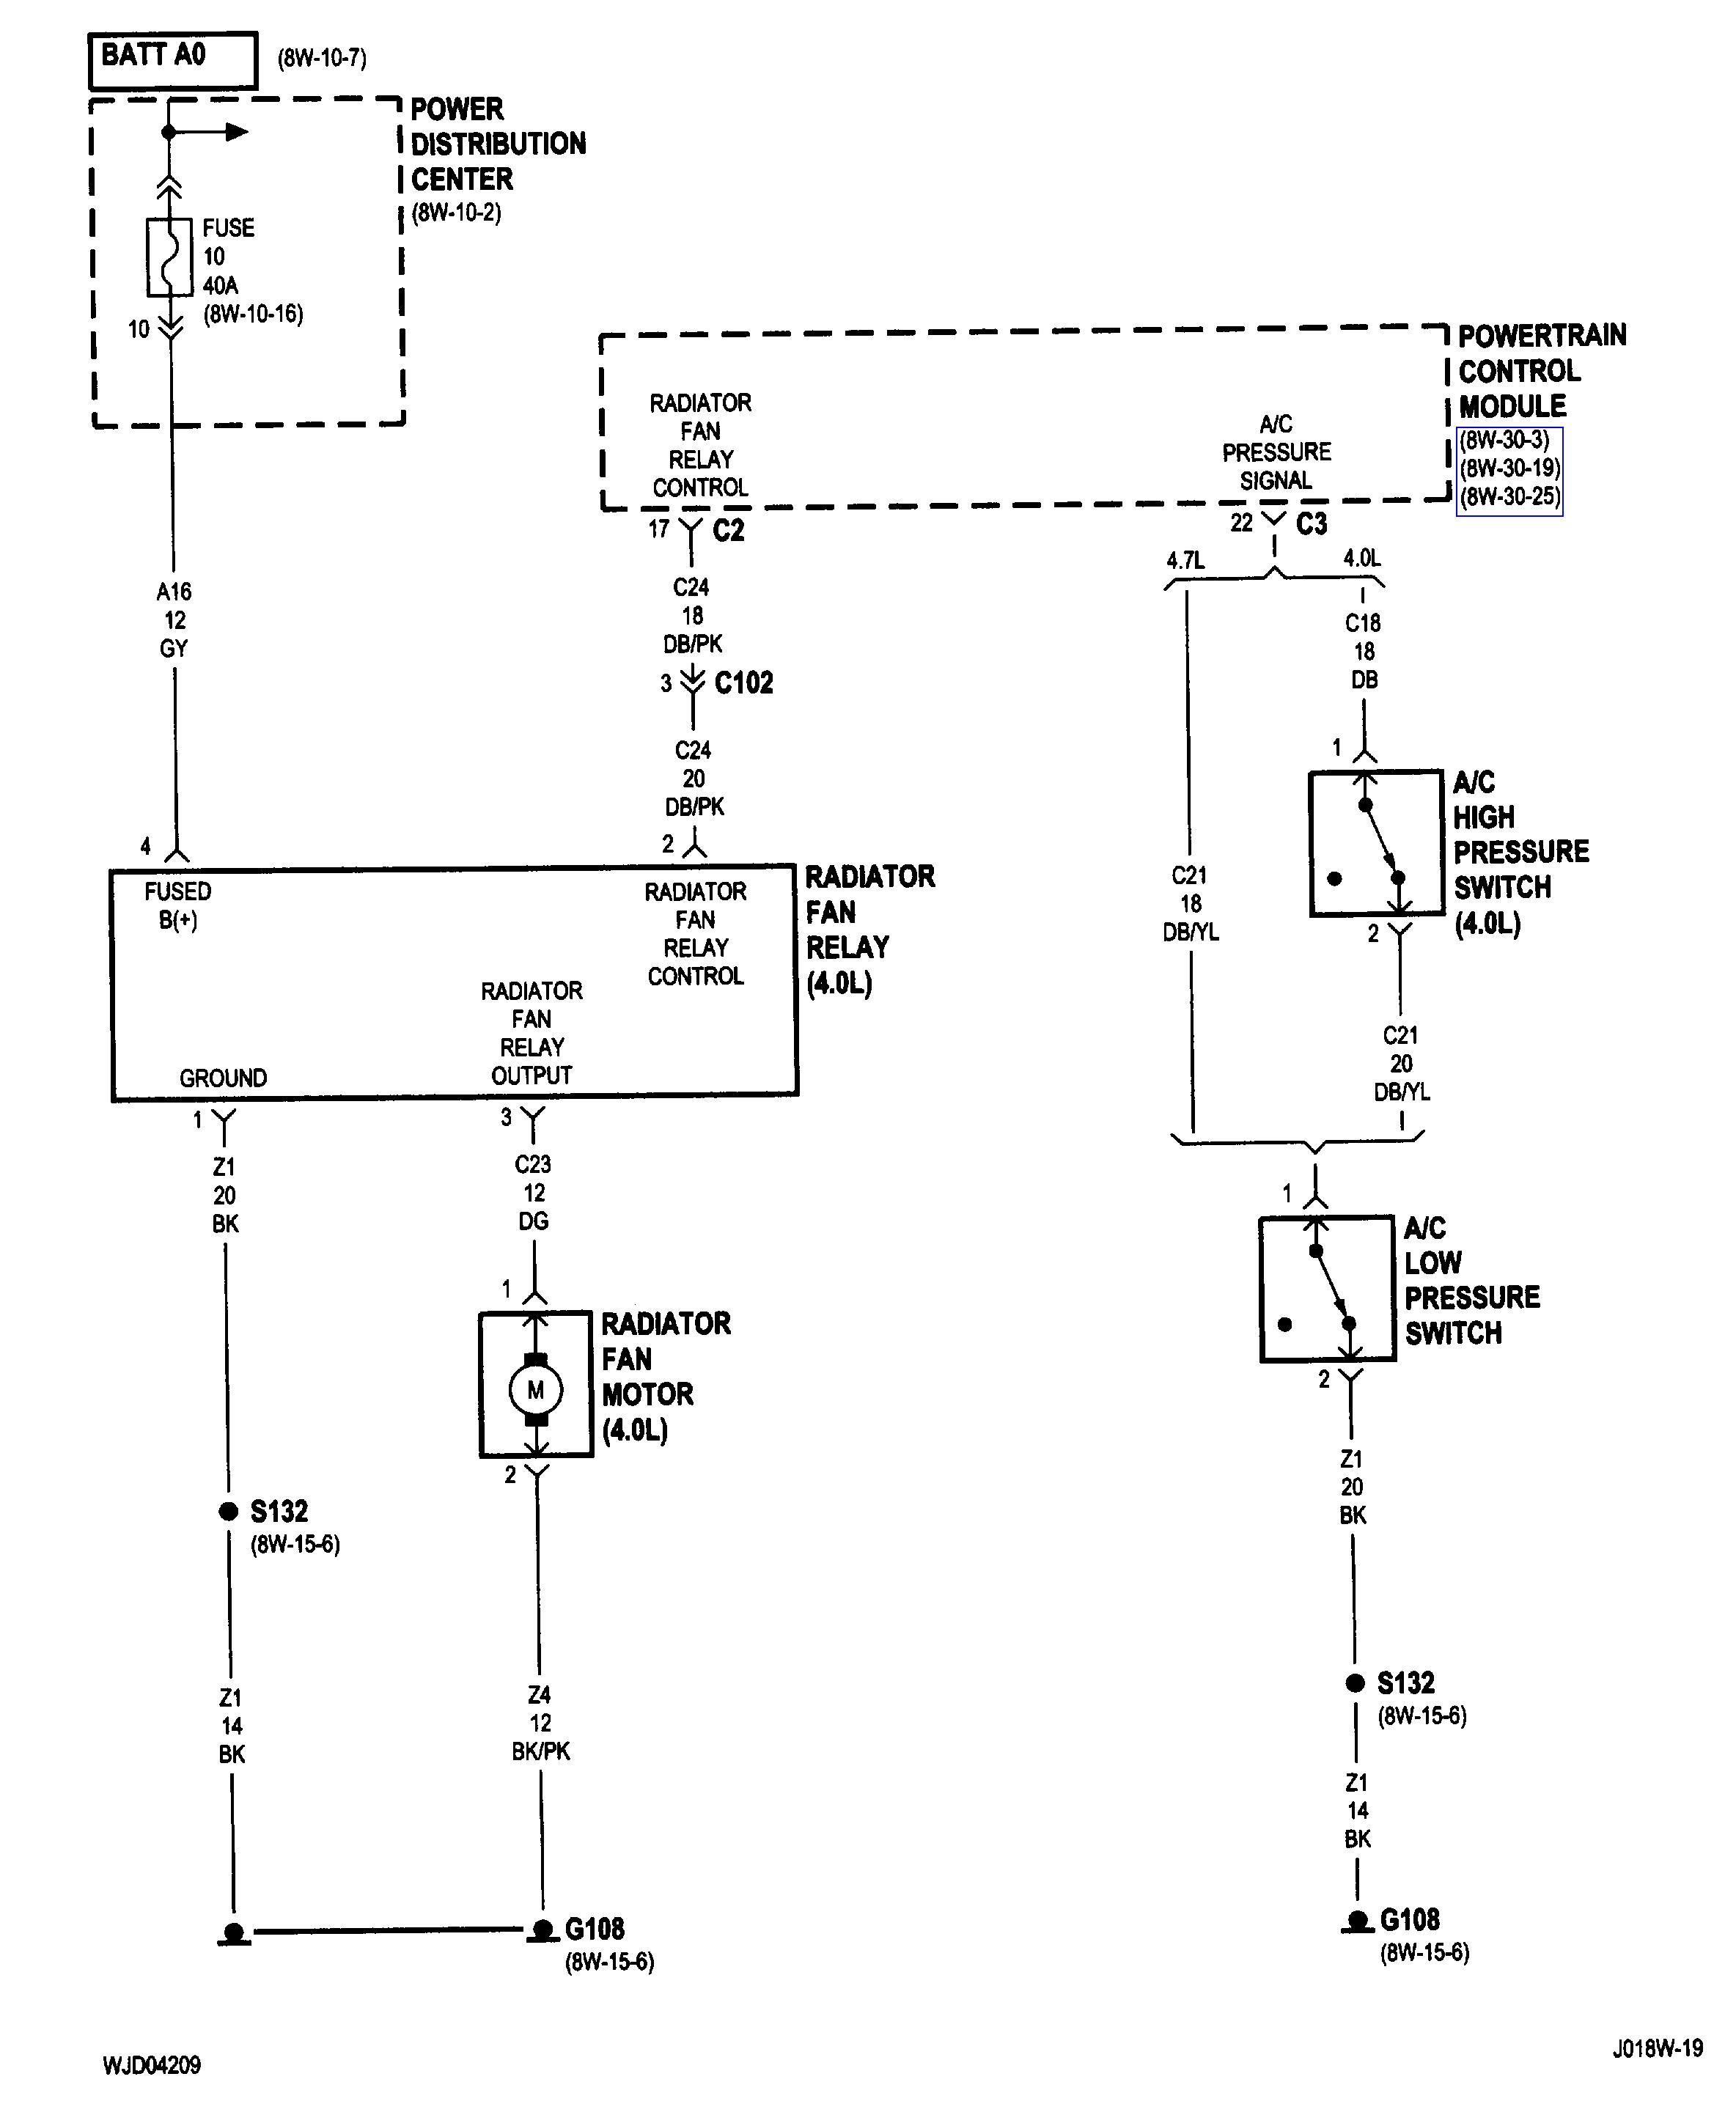 Grand Cherokee Fan Wiring Diagram - Wiring Diagram Server procedure-answer  - procedure-answer.ristoranteitredenari.it | 99 Jeep Grand Cherokee Wiring Diagram |  | Ristorante I Tre Denari Manerbio